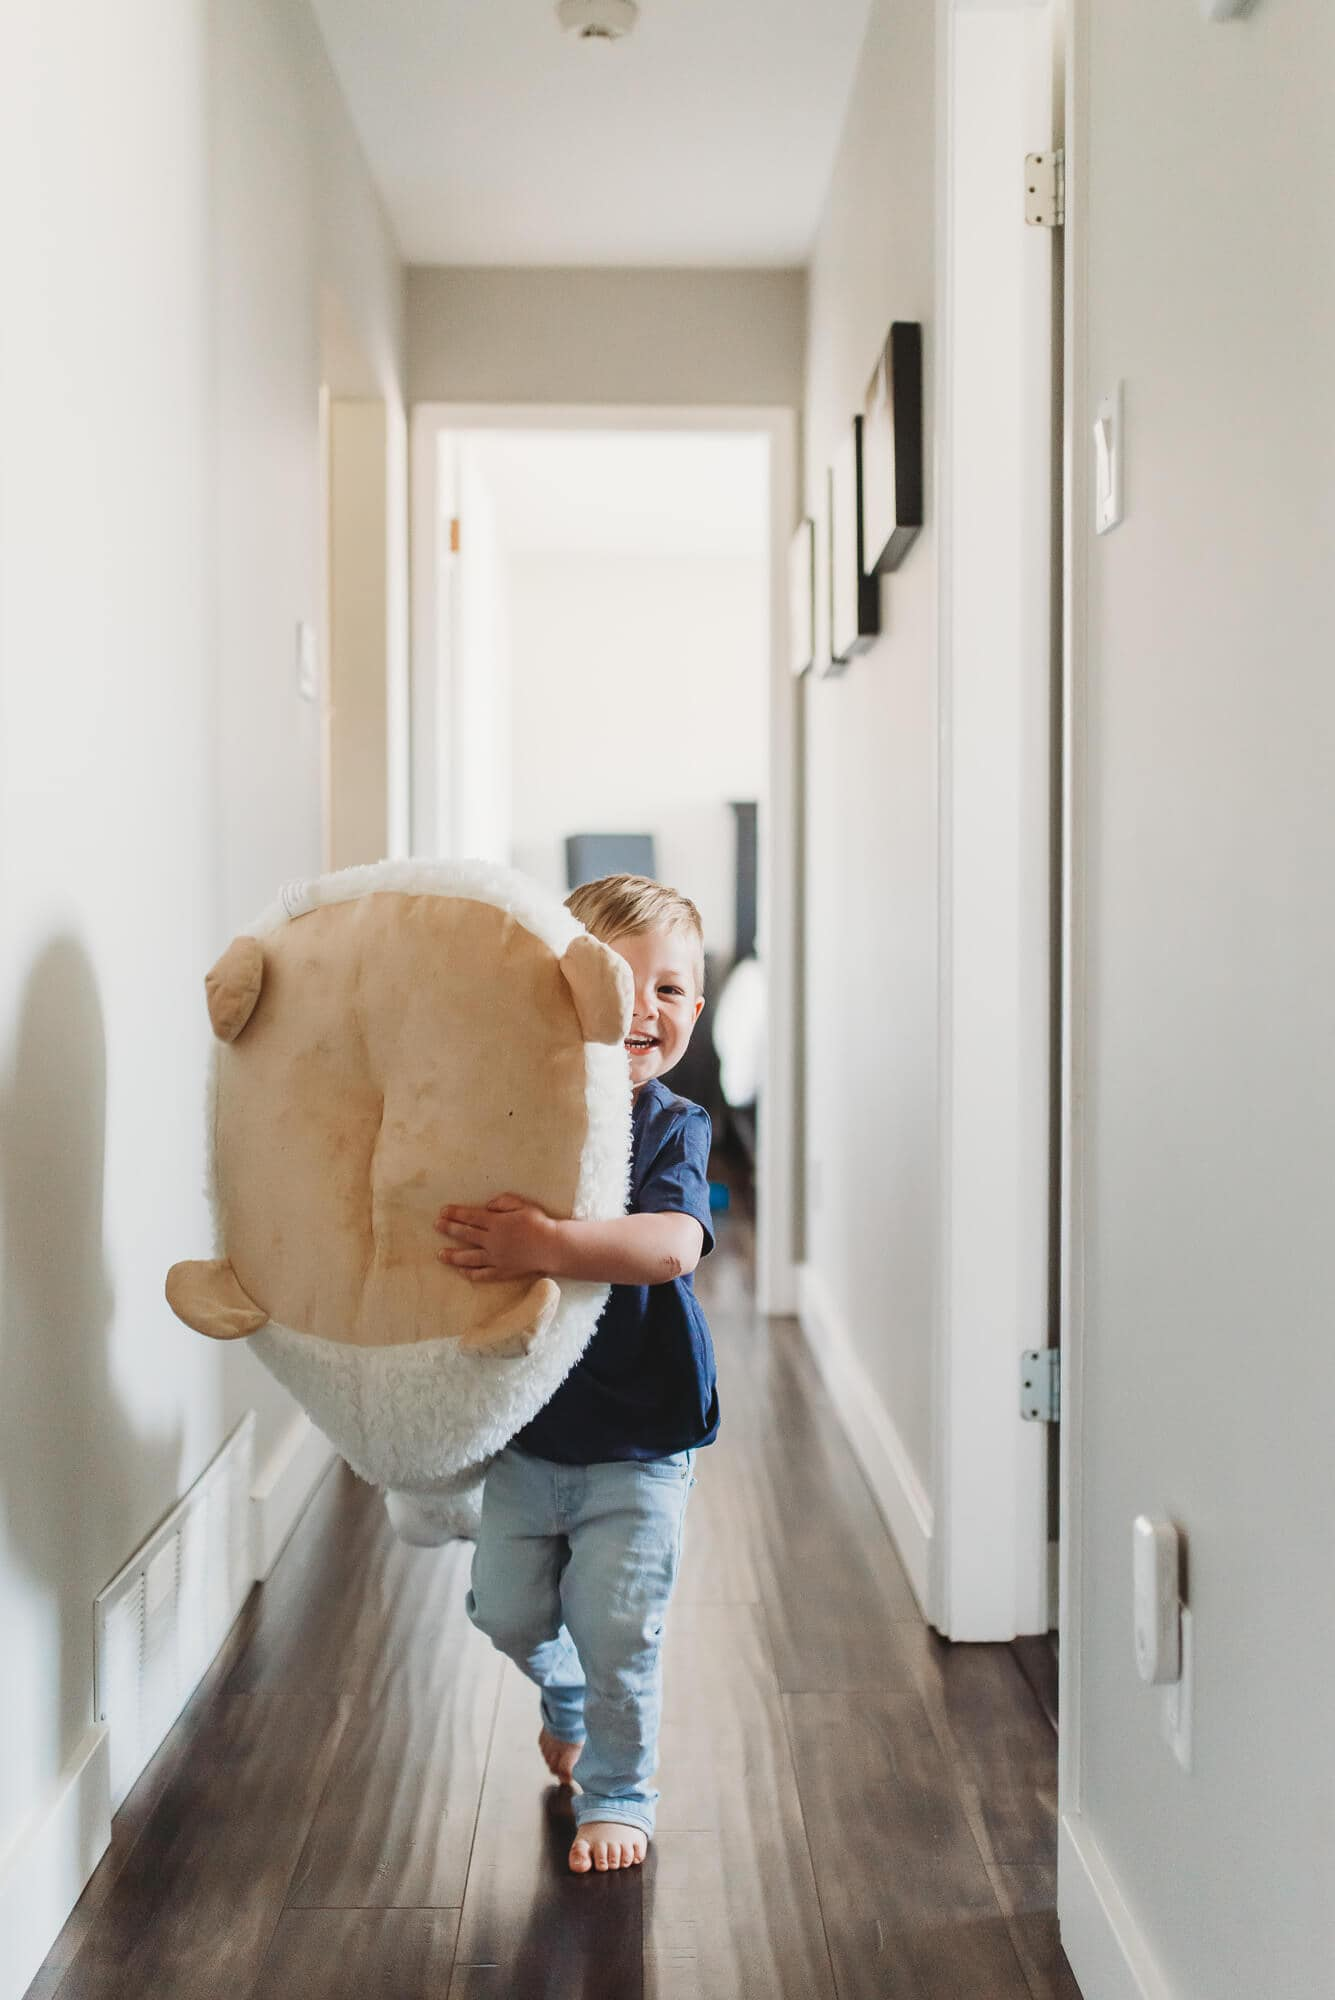 boy running down hall with giant stuffed animal